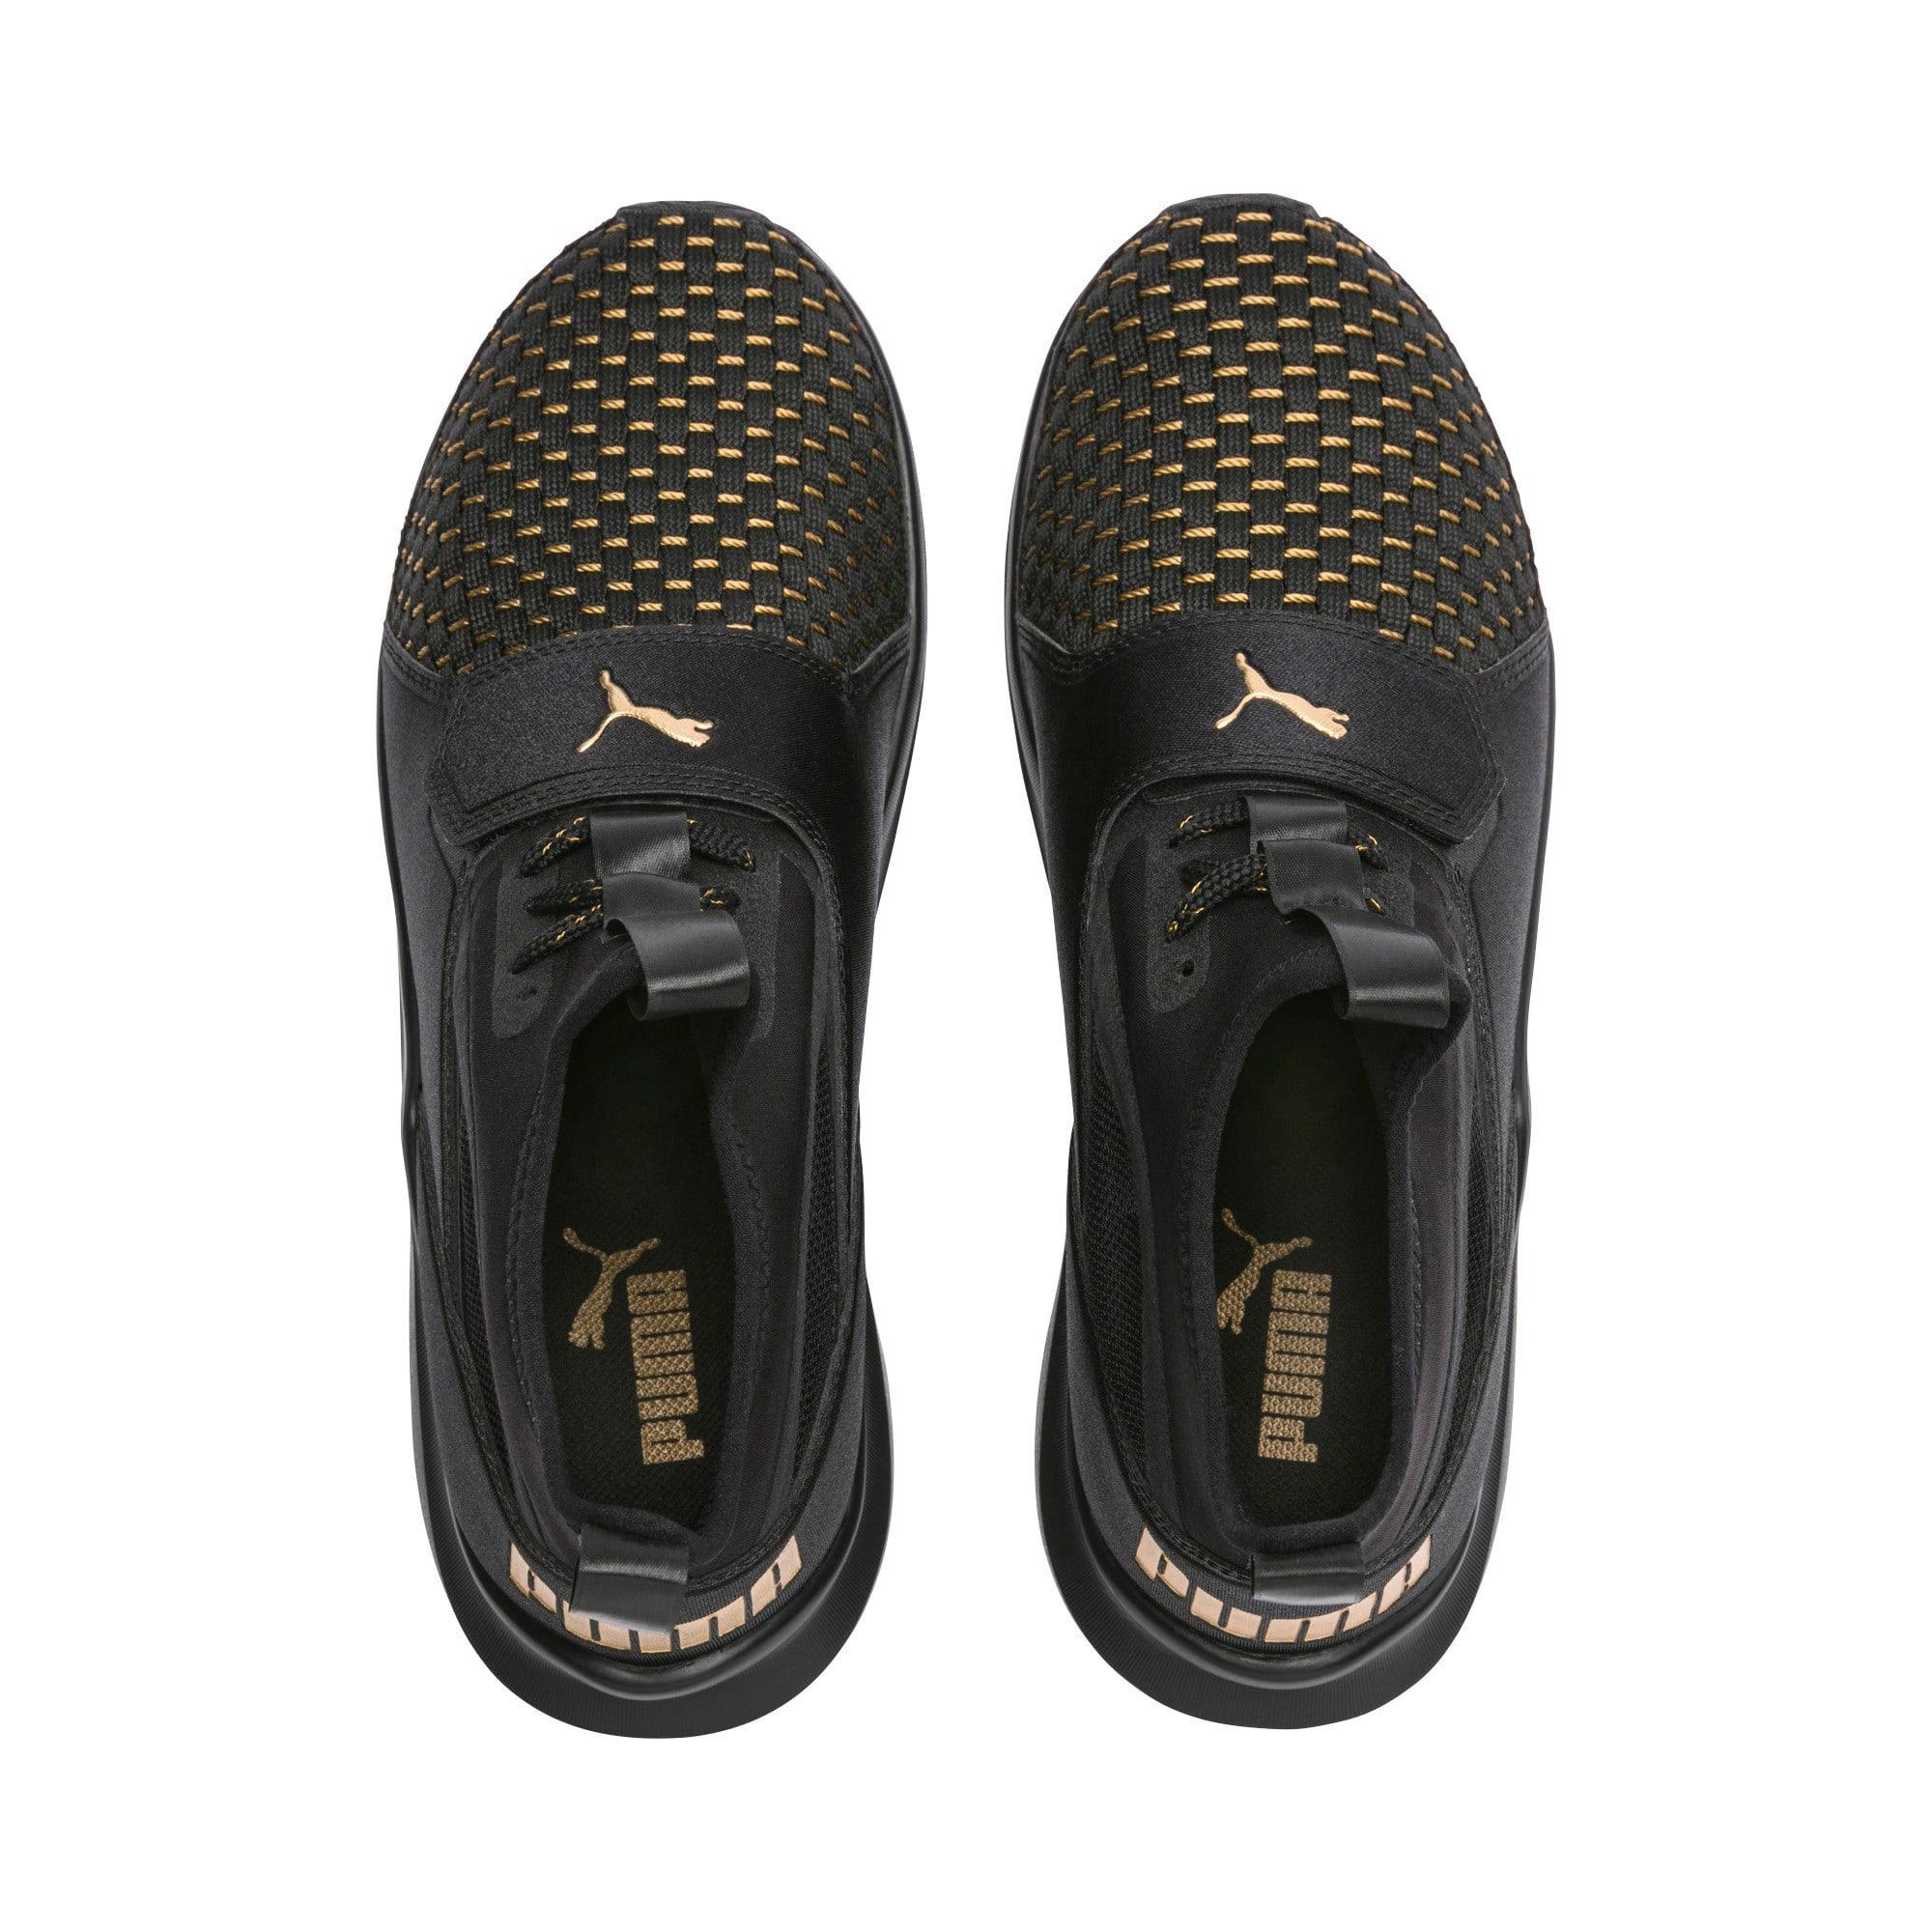 Thumbnail 3 of Phenom Varsity Women's Training Shoes, Puma Black-Puma Black, medium-IND